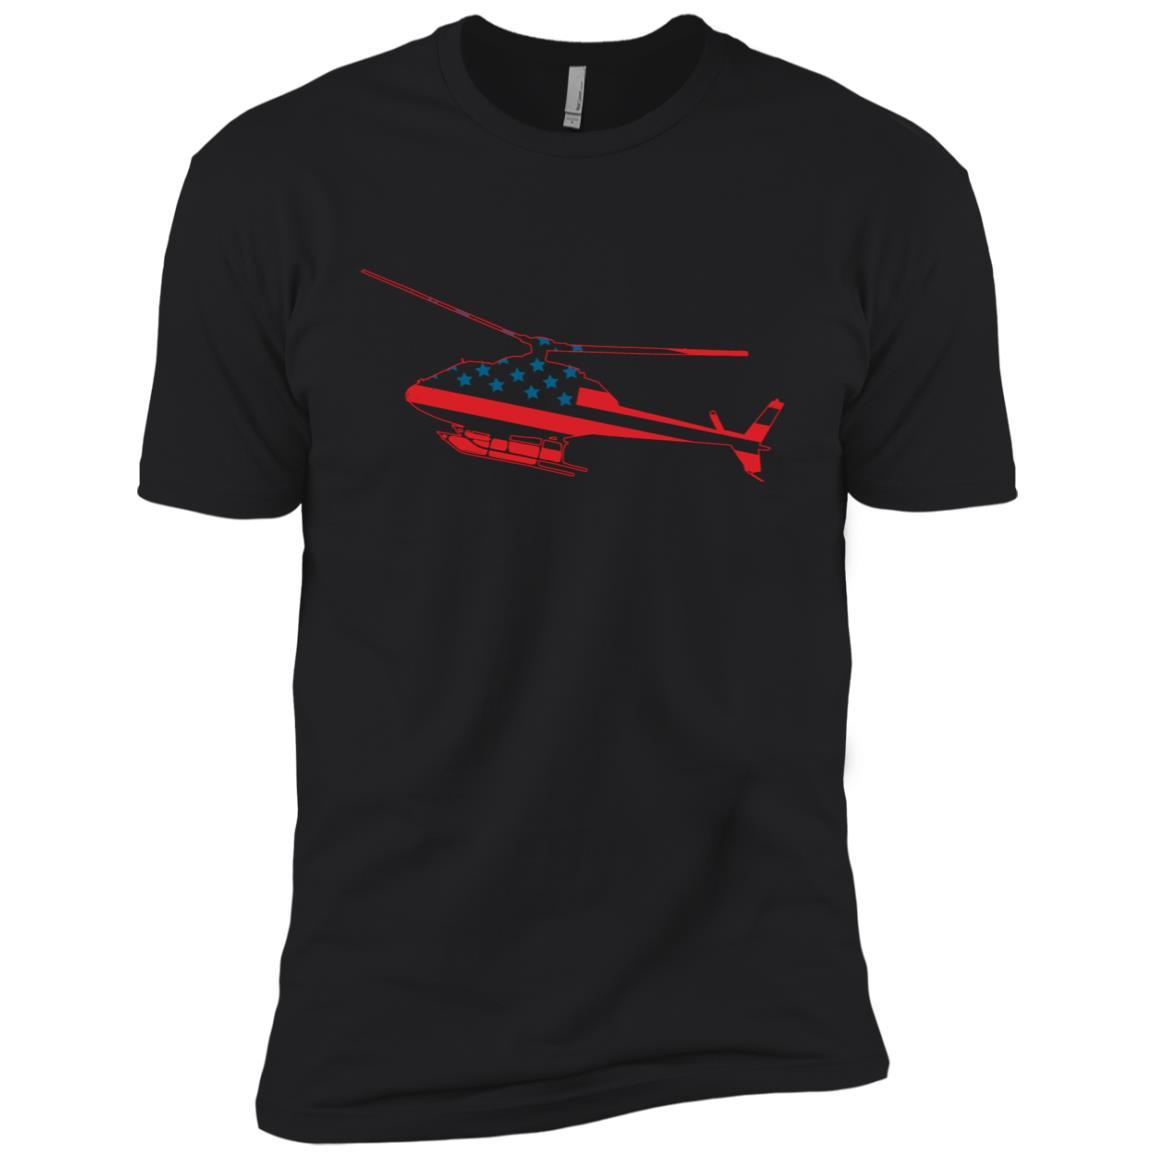 Air Force Helicopter Pilot Men Short Sleeve T-Shirt